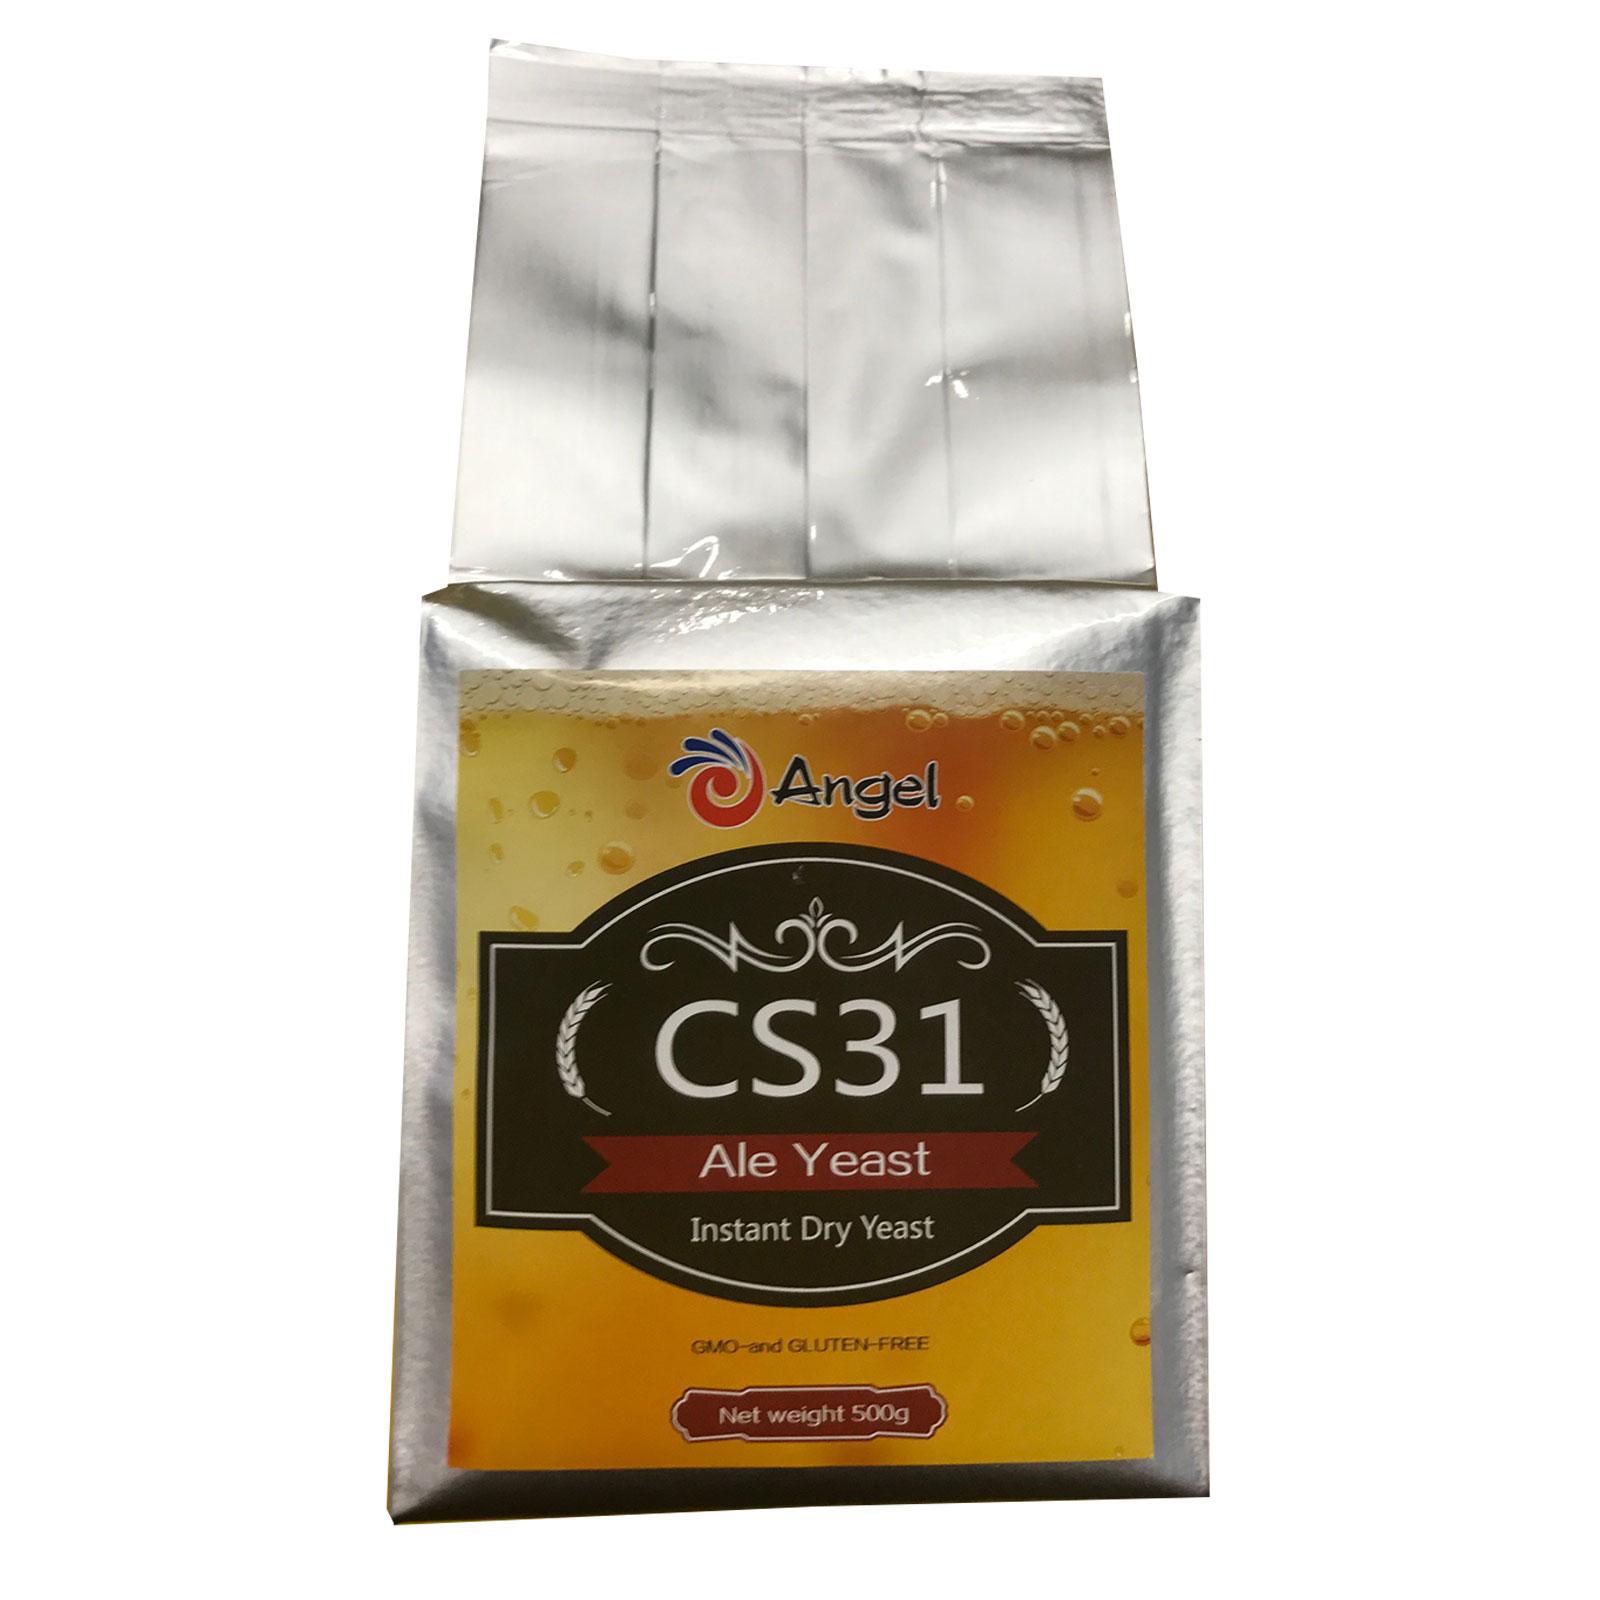 Dry yeast for CS31 beer Belgian Ale Yeast 500 gr